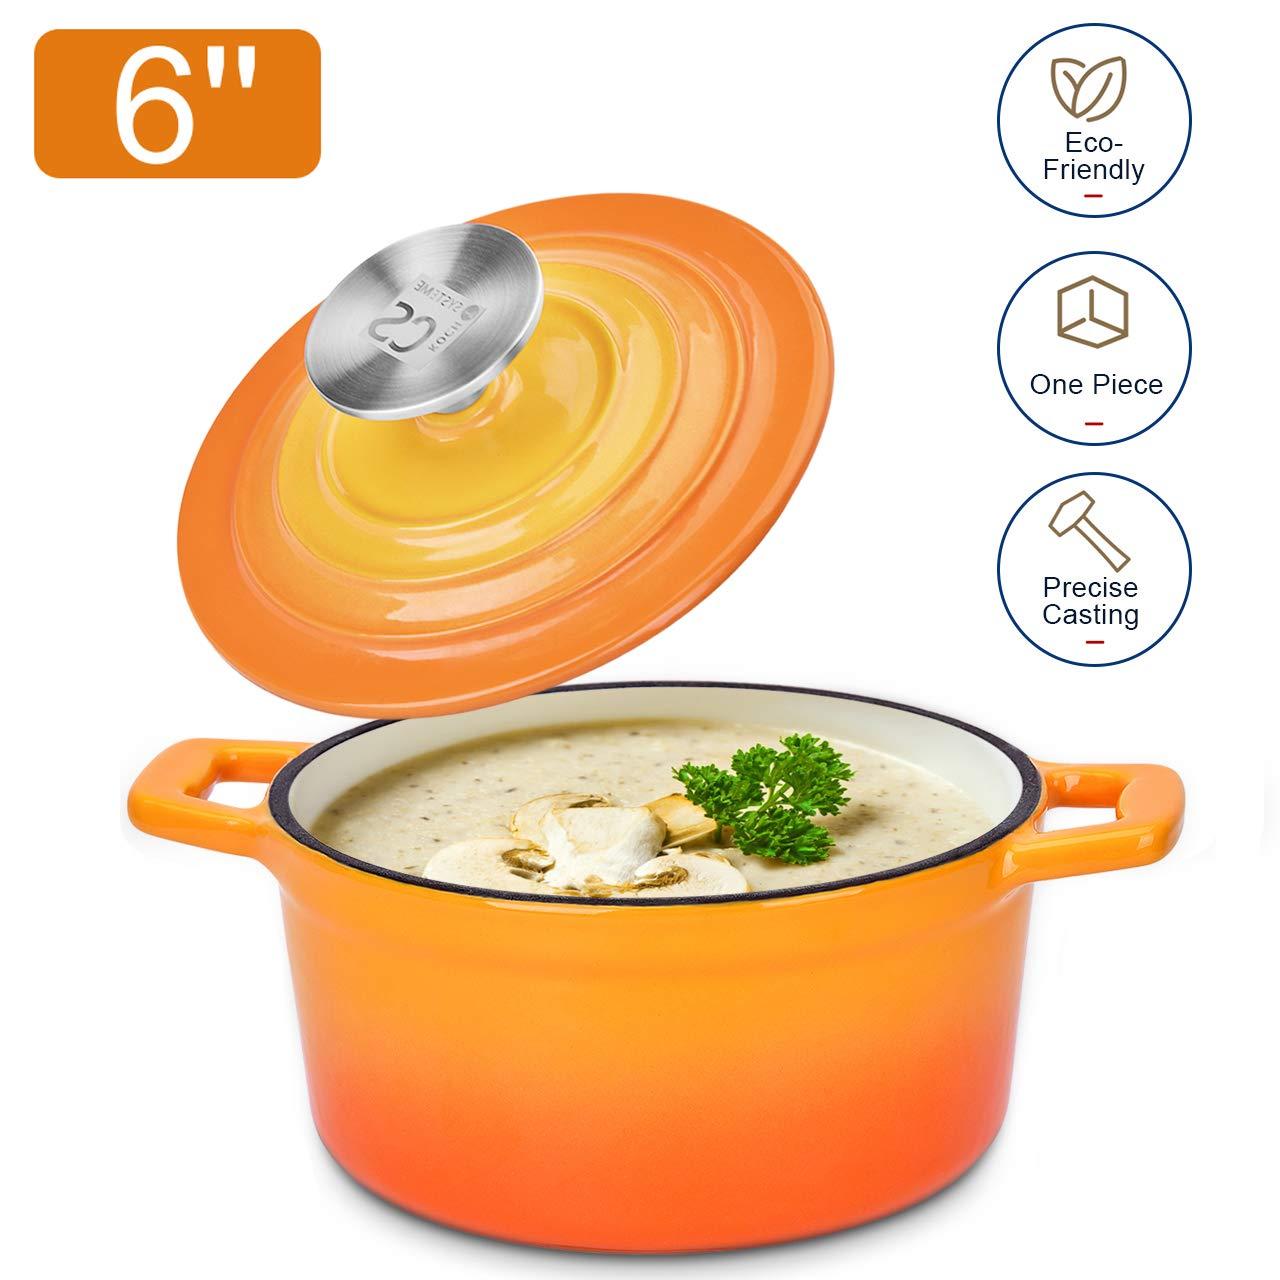 Dutch Oven Cast Iron Enamel Coating Cookware Casserole with Lid - 0.5-Quart (5.91 inches) , Sunset Orange Cocotte, Versatile Saucepan with Lid, Stew Pot